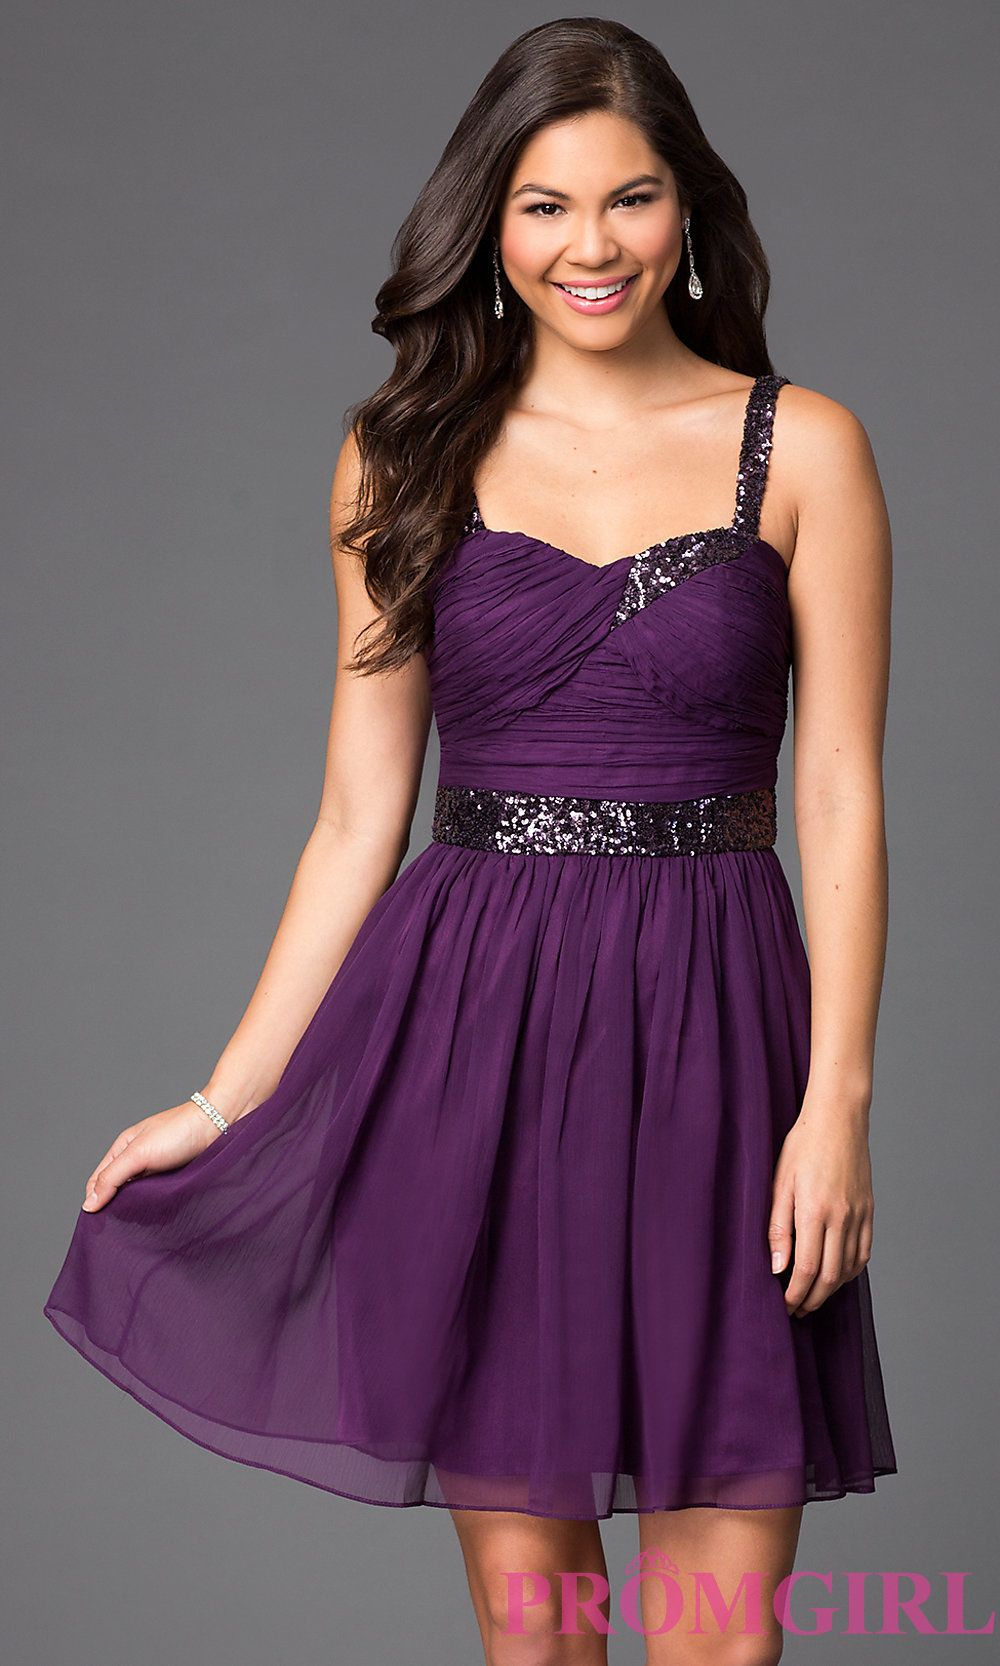 Short Sleeveless Purple Party Dress | Homecoming 2016 Under $100 ...